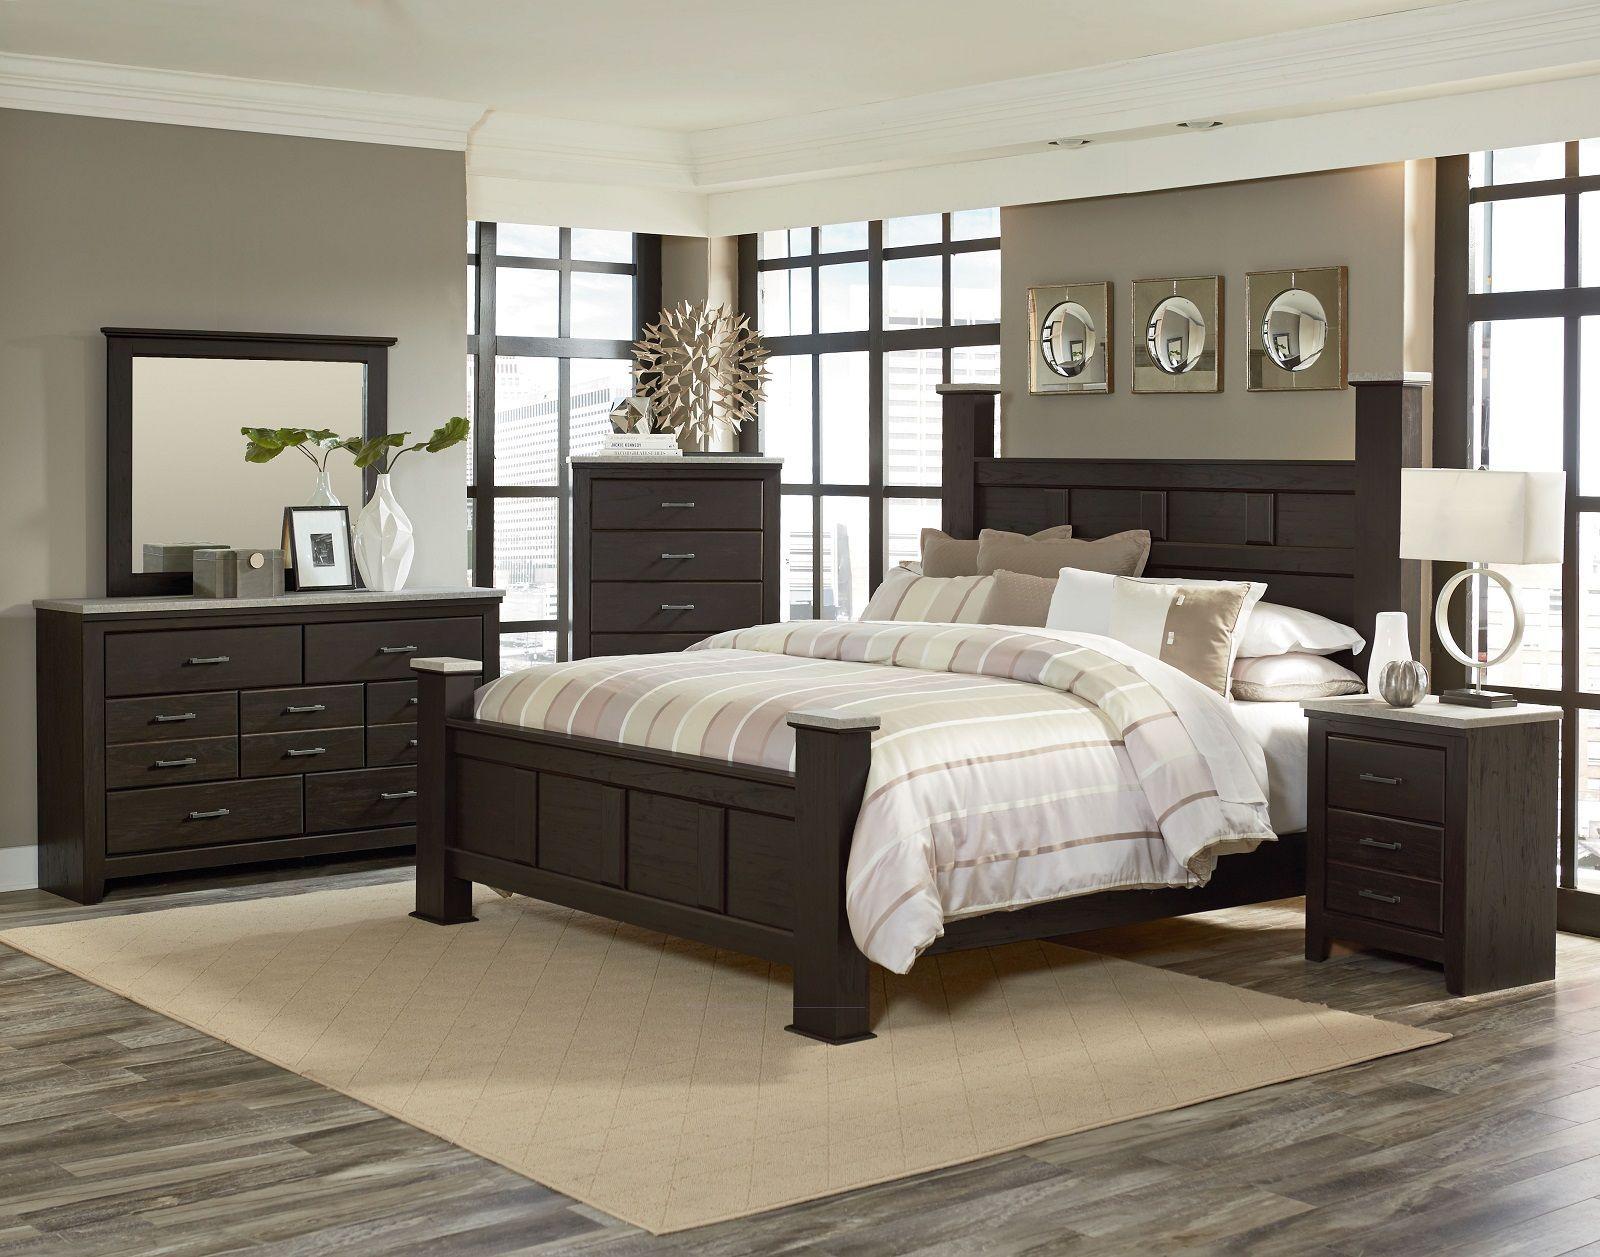 Standard Furniture Stonehill 4 Piece Poster Bedroom Set In